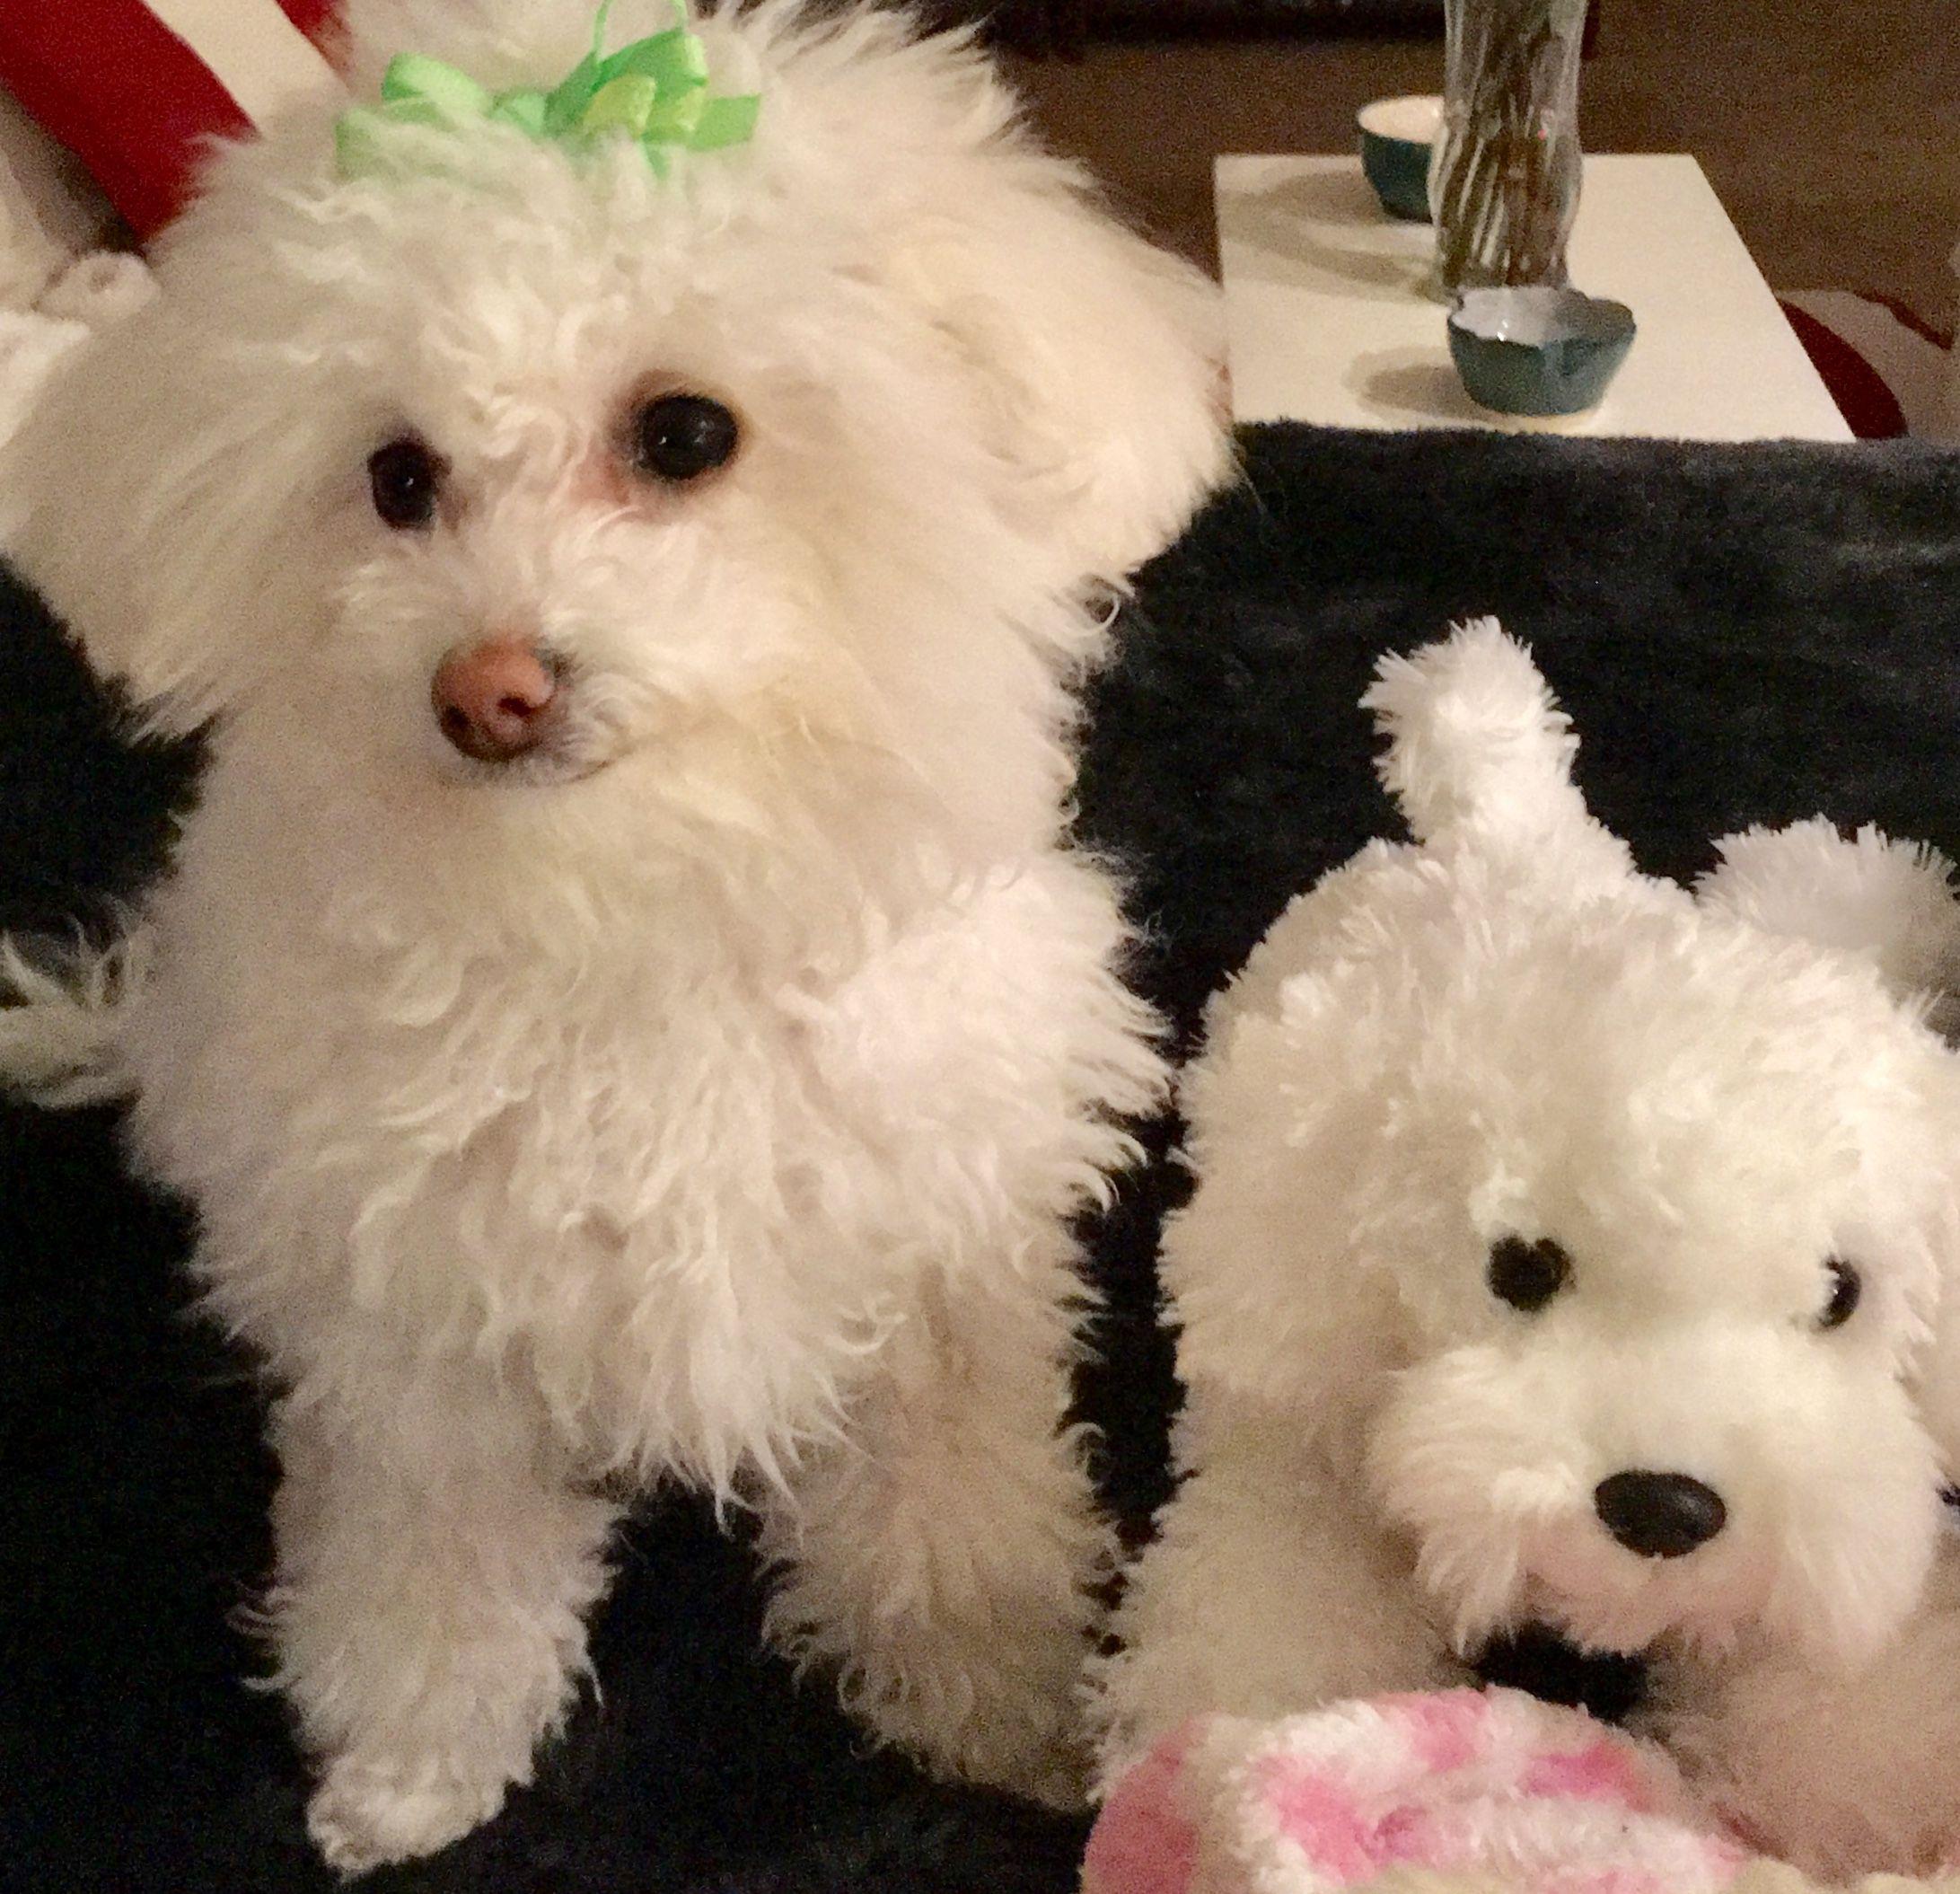 Designer Breed Half Toy Poodle And Half Maltese She S A